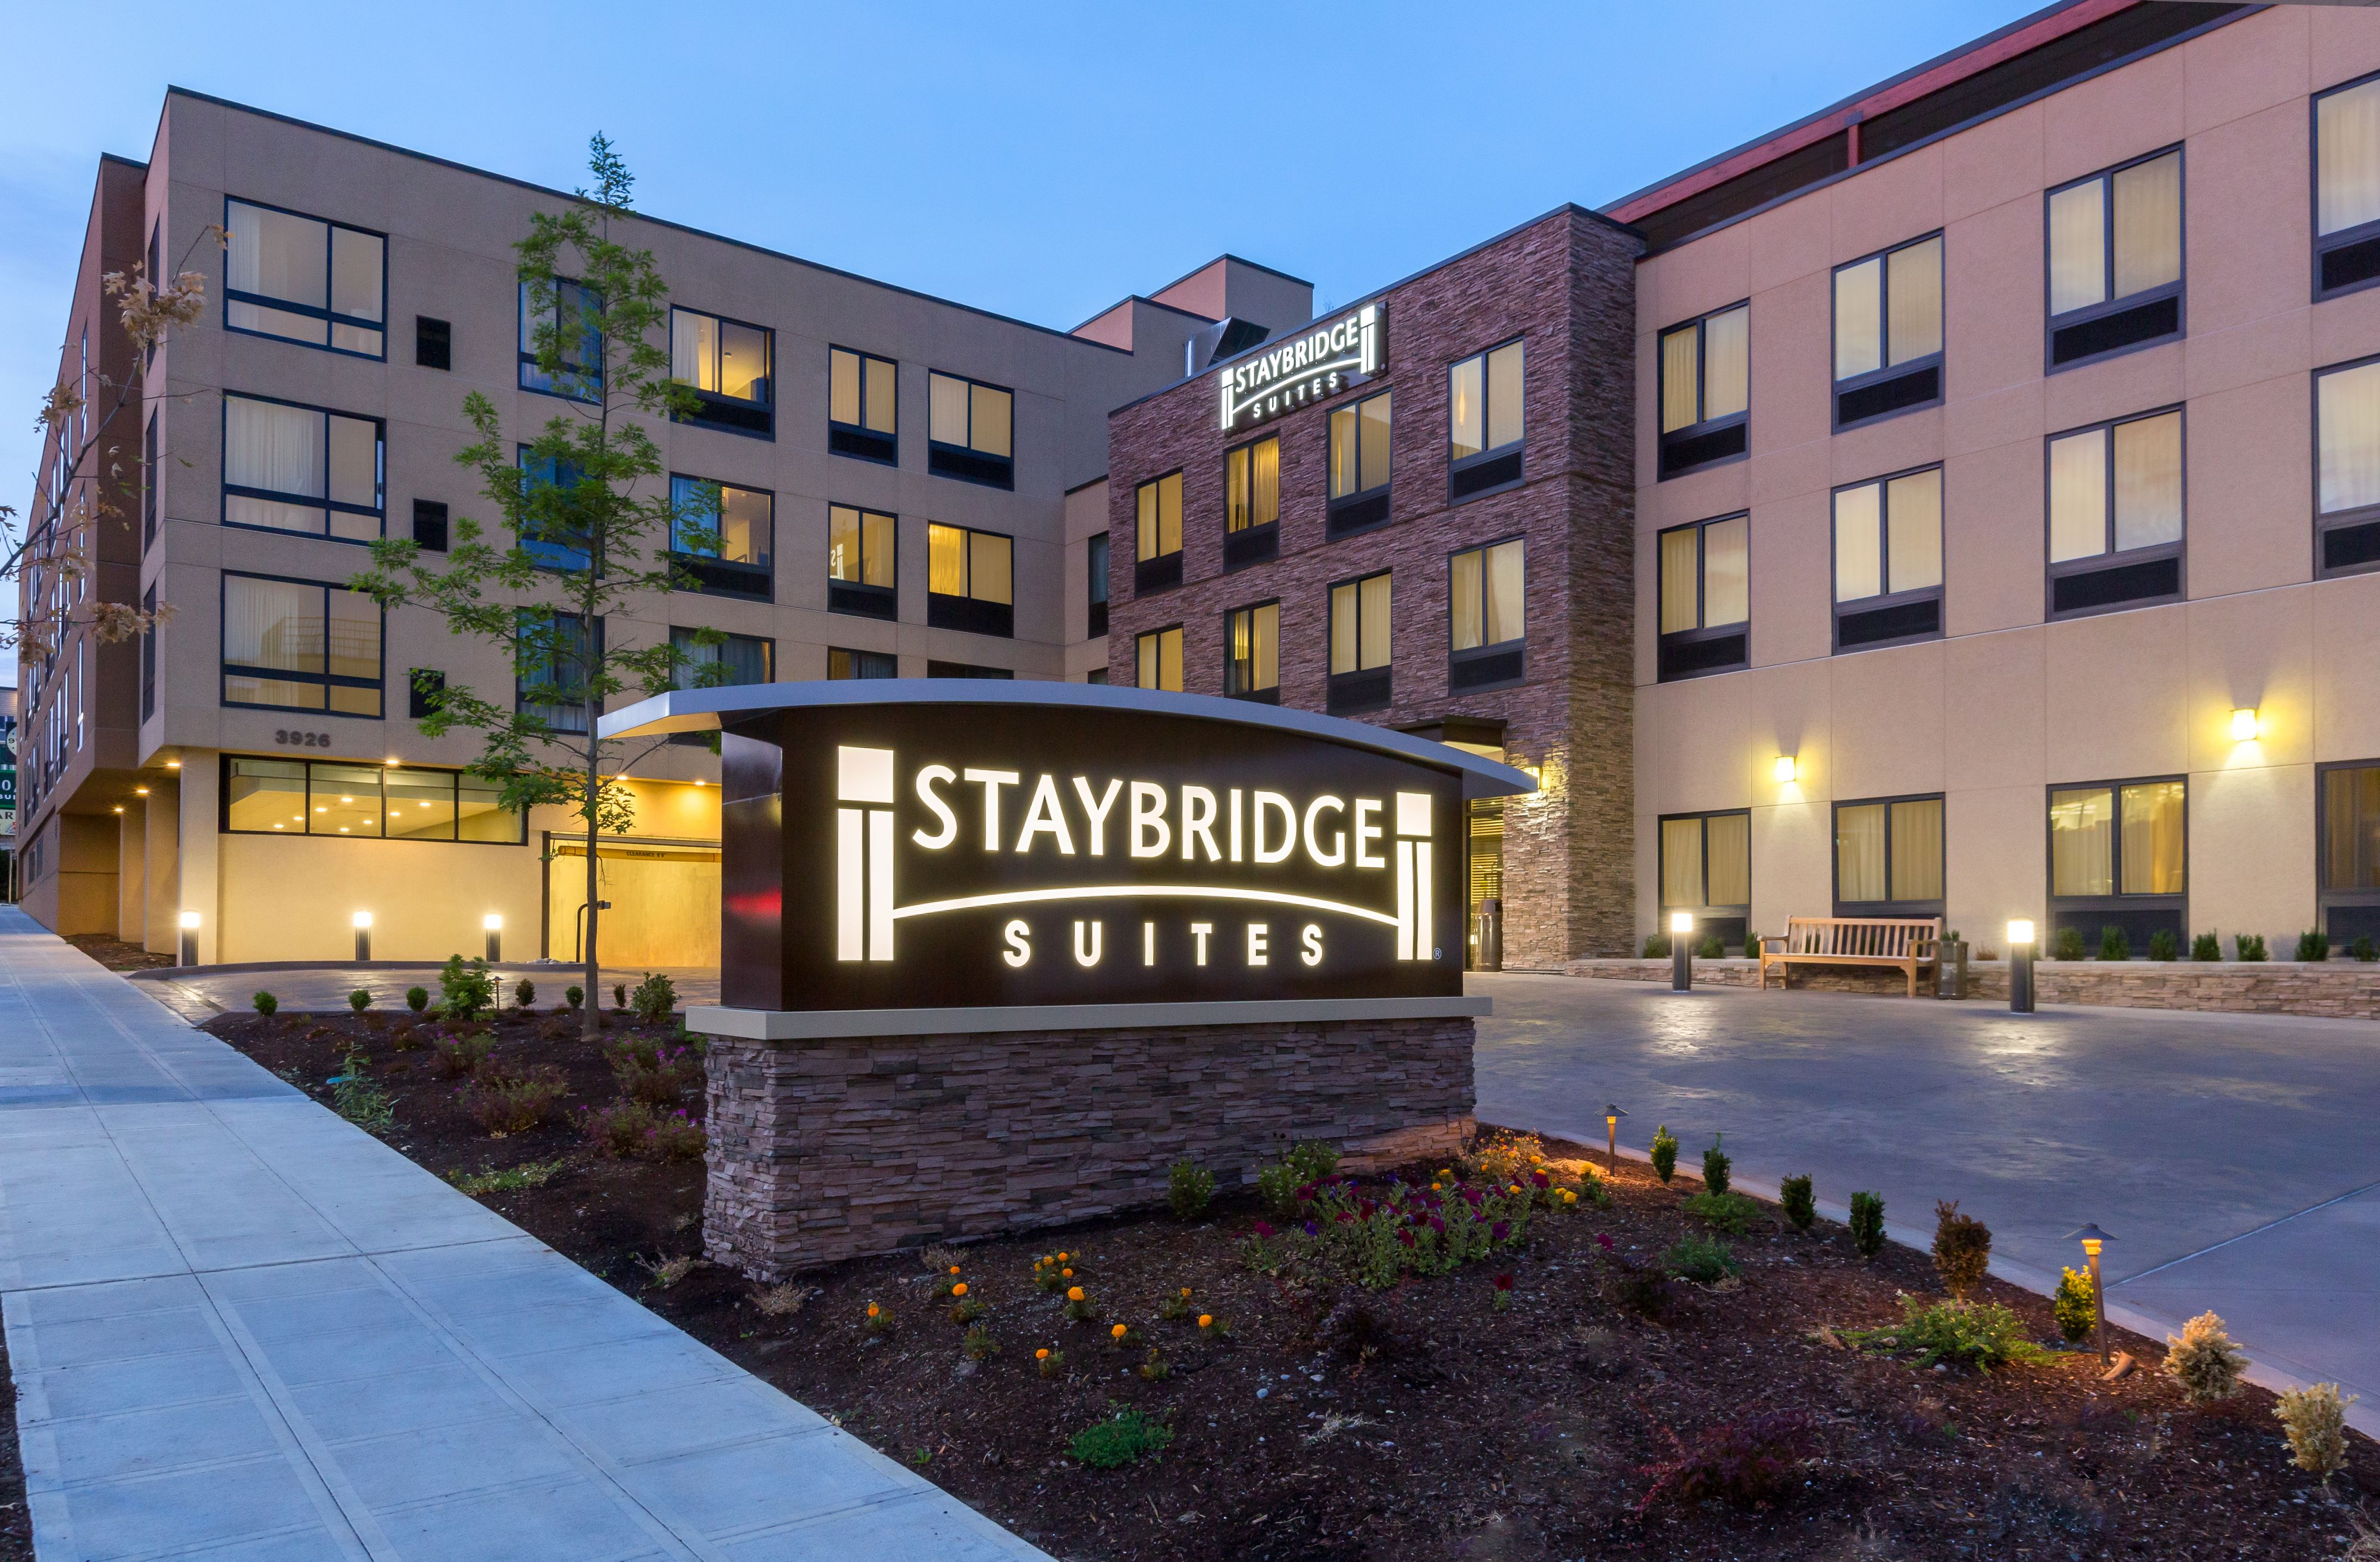 staybridge-suites-seattle-4079661105-original.jpg